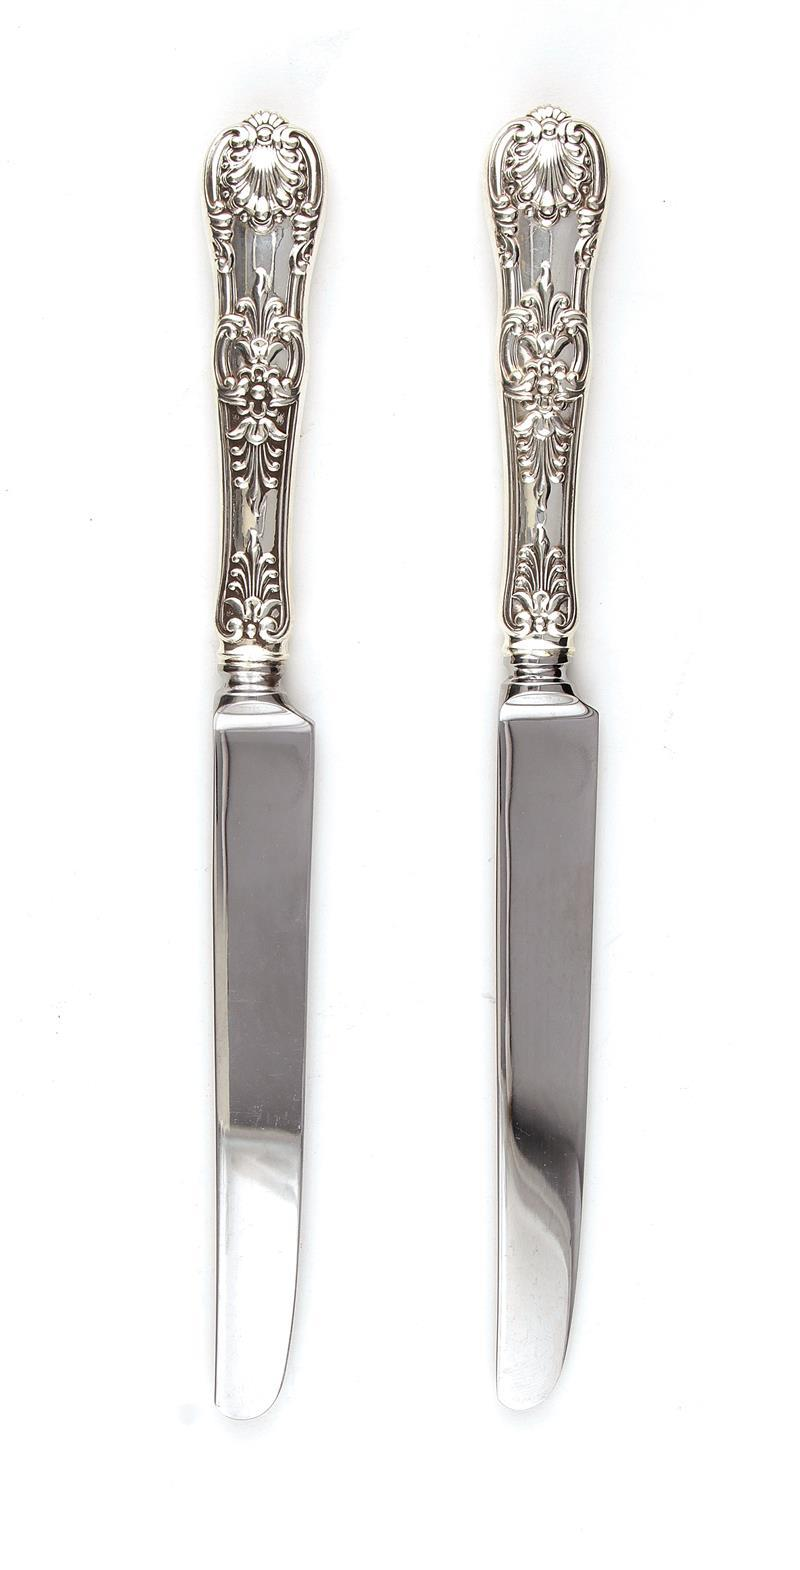 Tiffany & Co King pattern silver knives (12pcs)